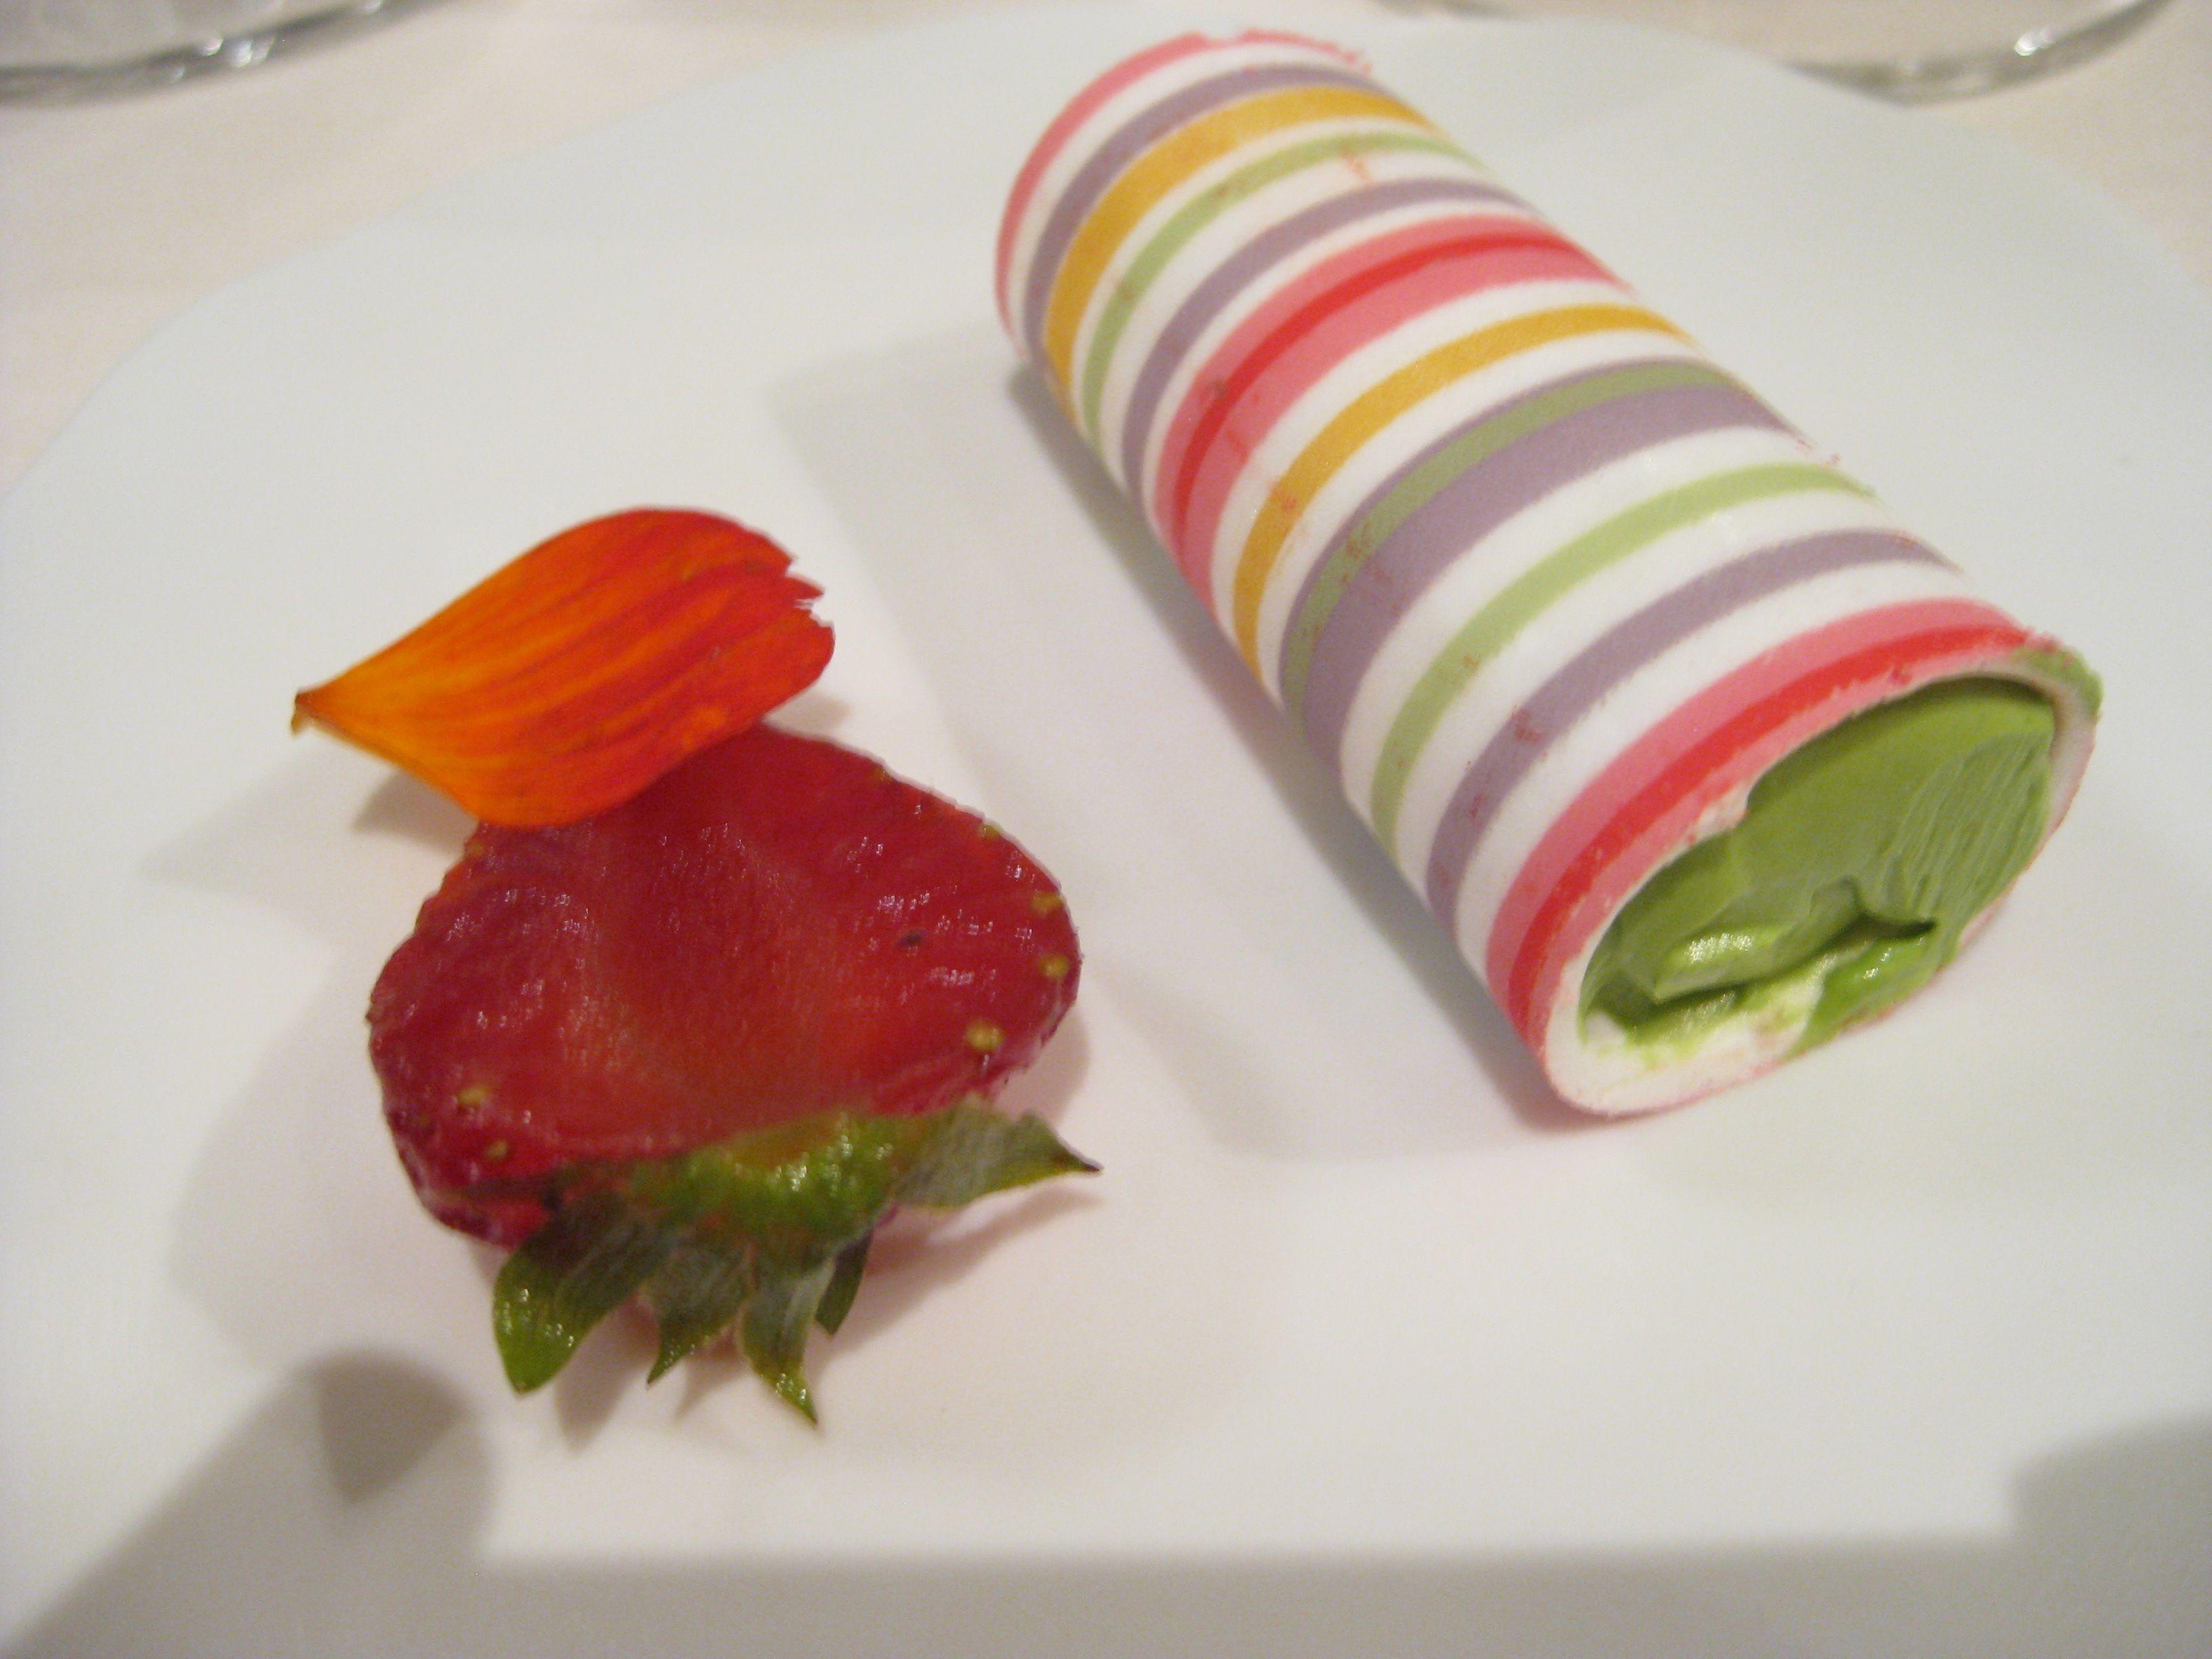 9 best restaurants paris michelin star images on pinterest